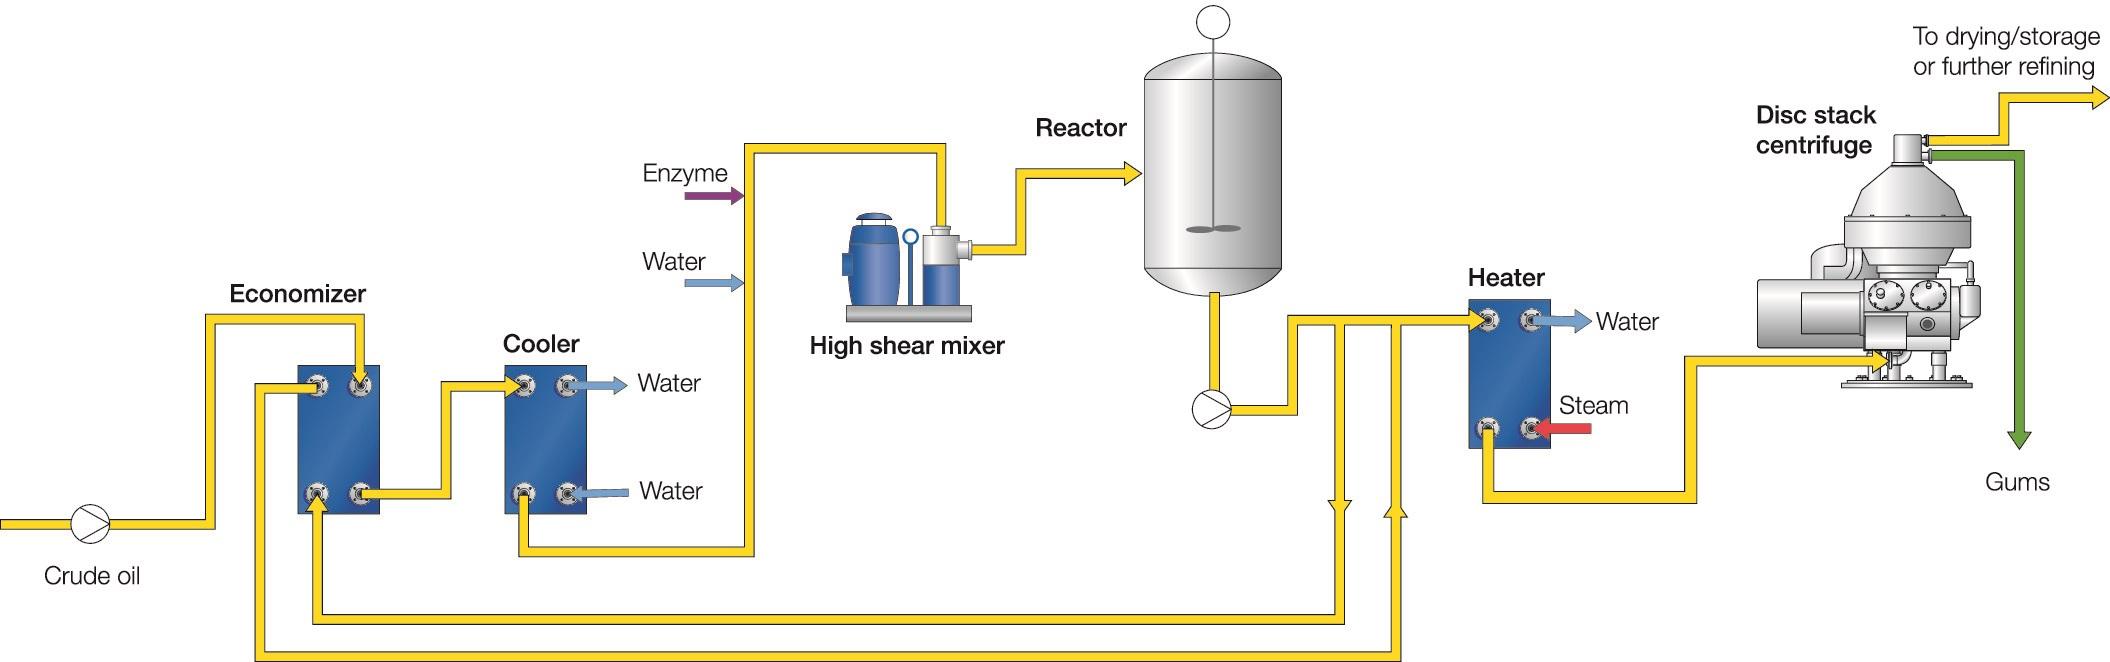 Enzymatic degumming process